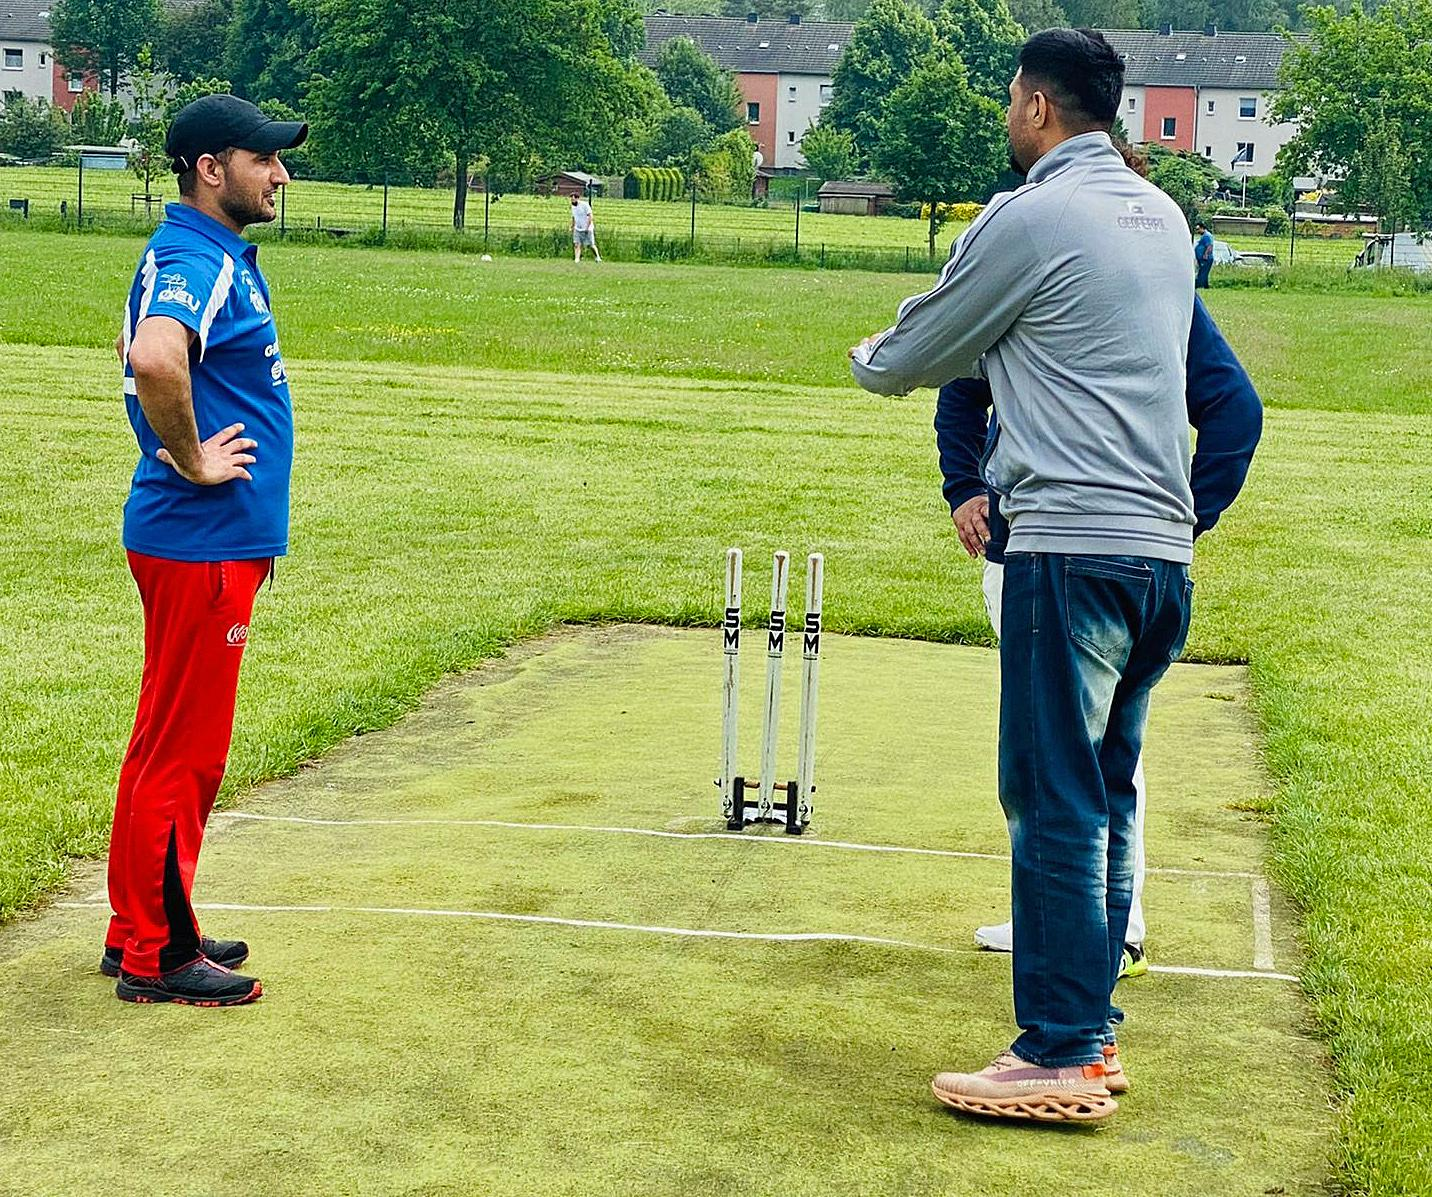 Cricket_6Juni2021_2